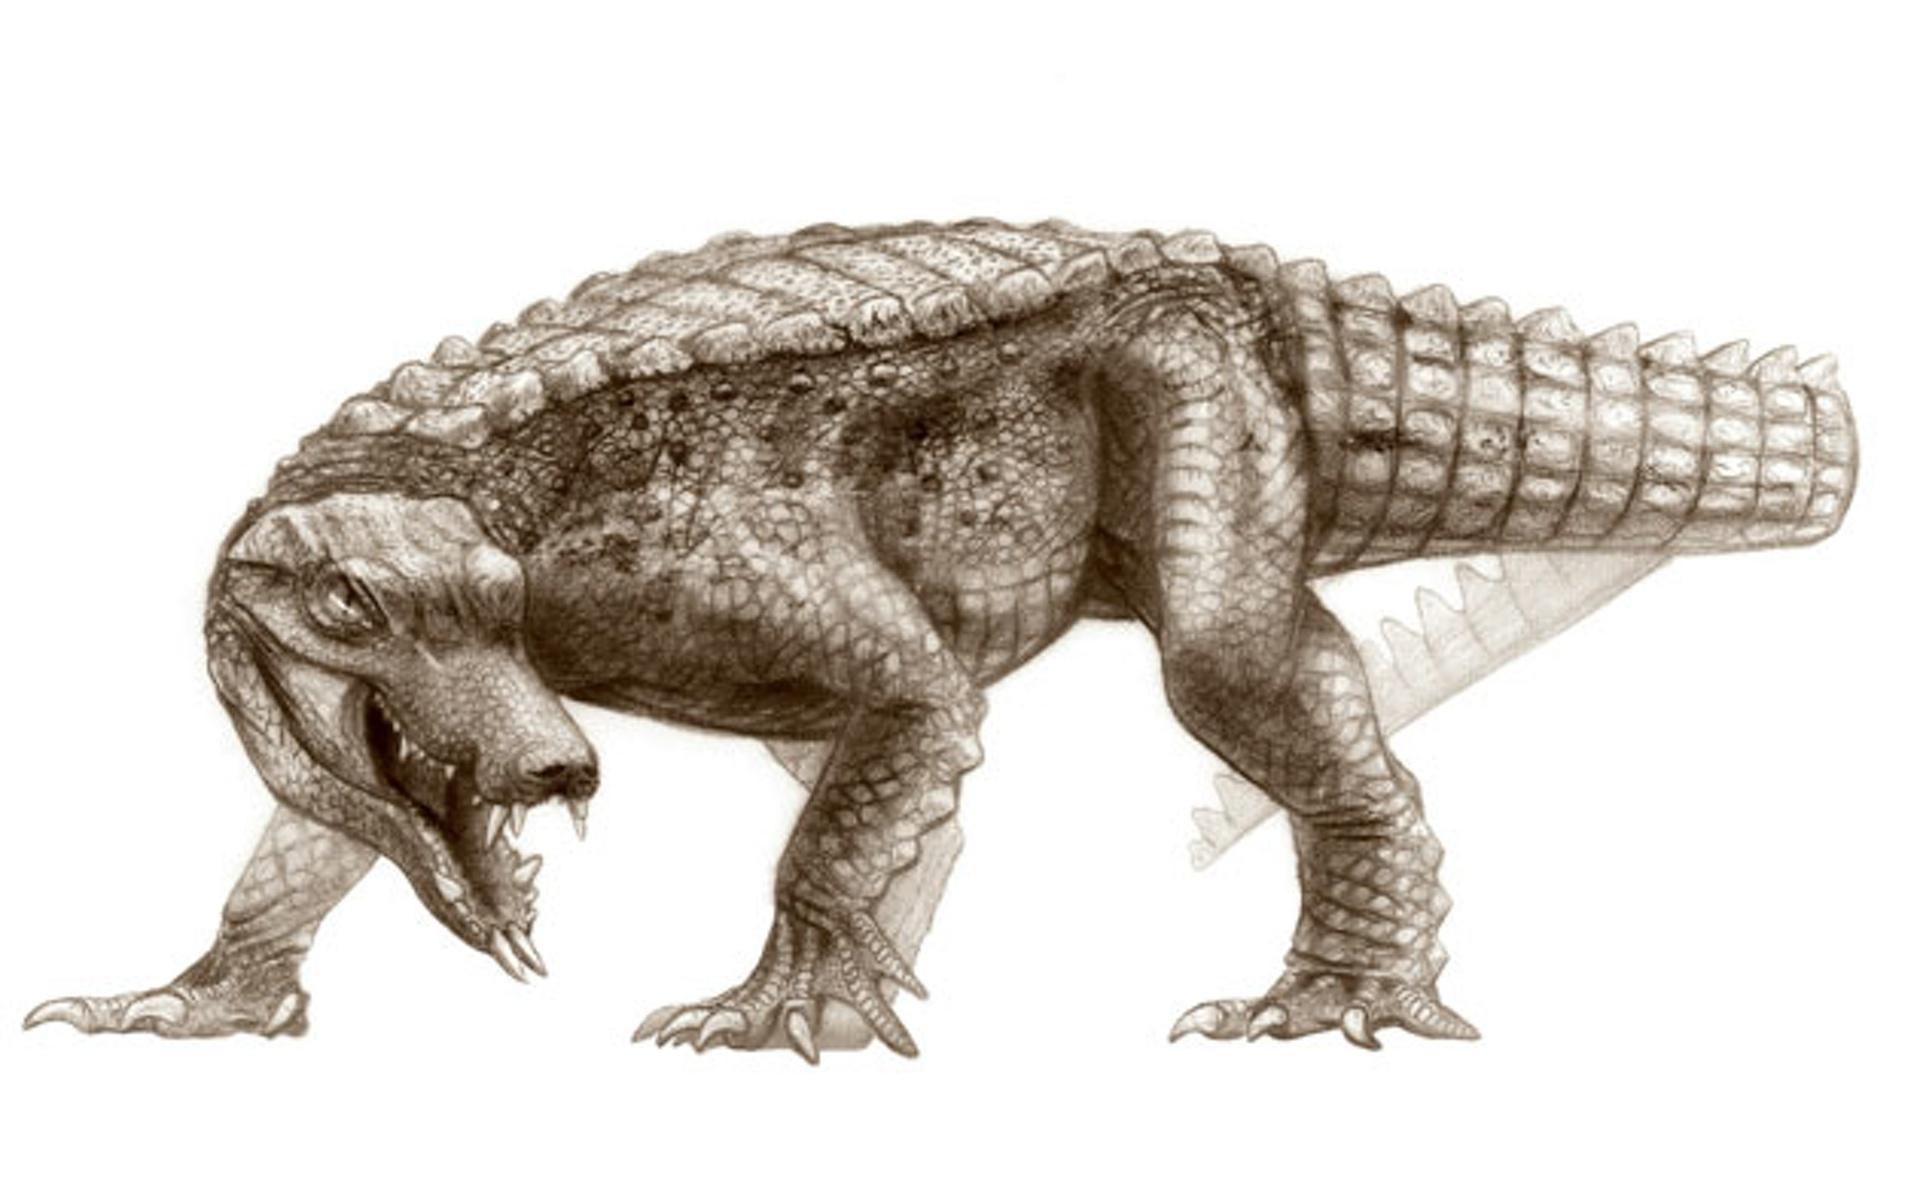 Cretaceous-Crocodyliforms-011